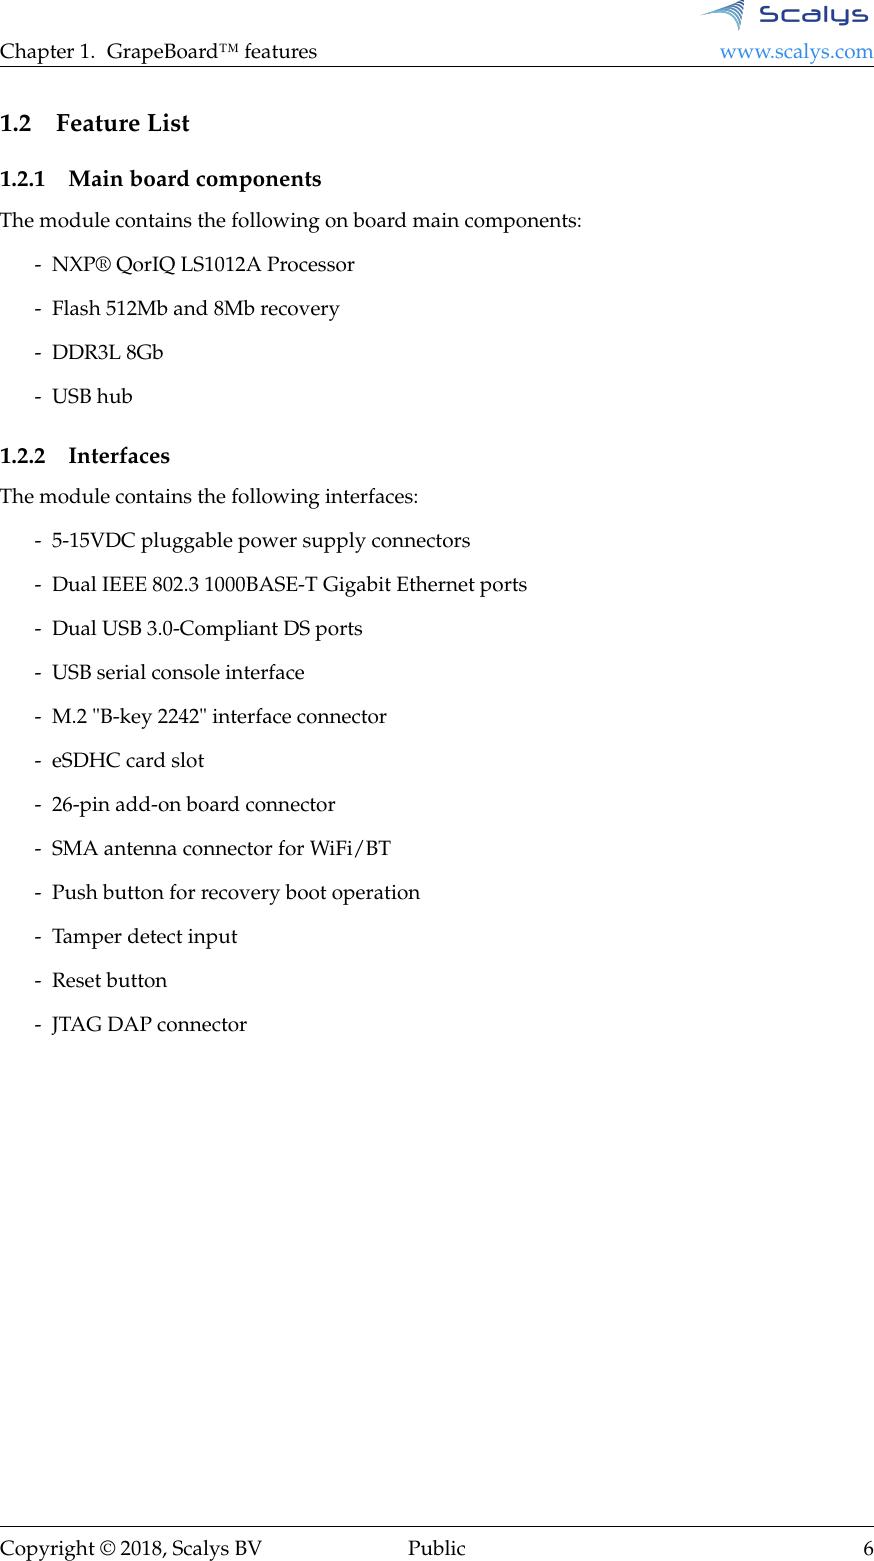 Scalys Grapeboard User Manual V1 0